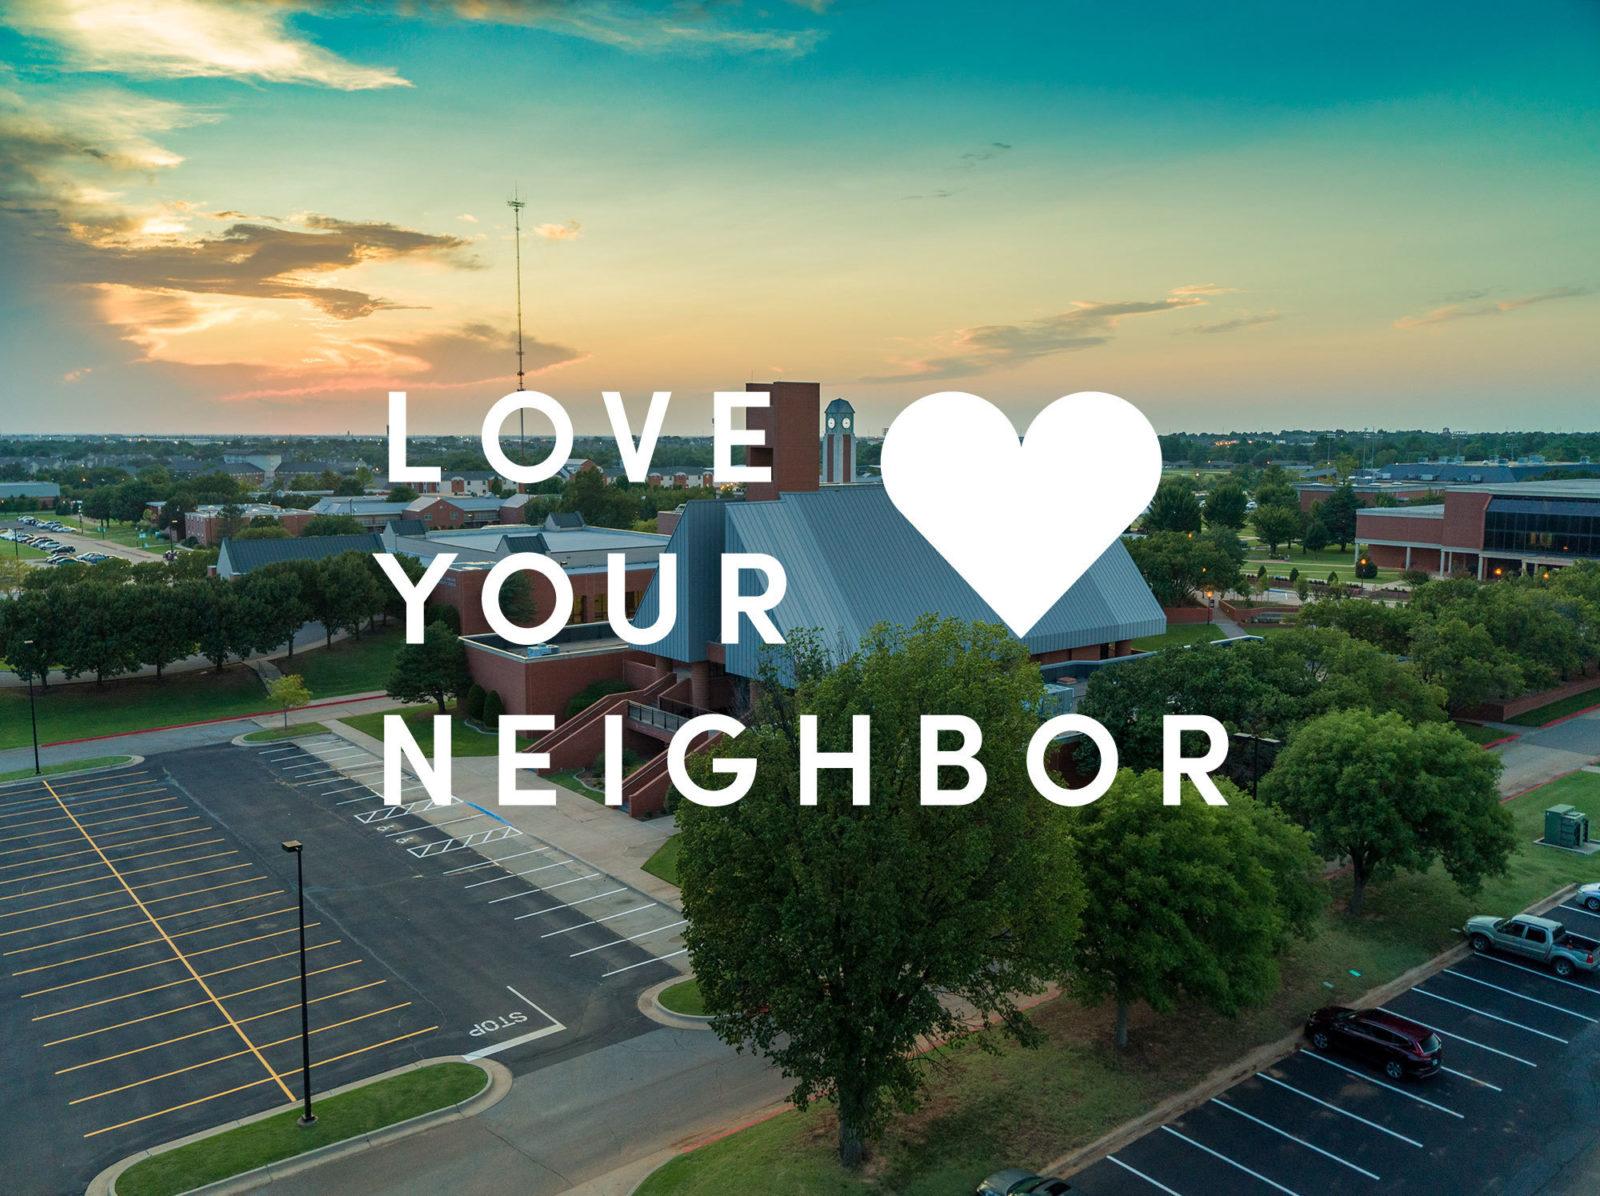 Love your neighbor drone